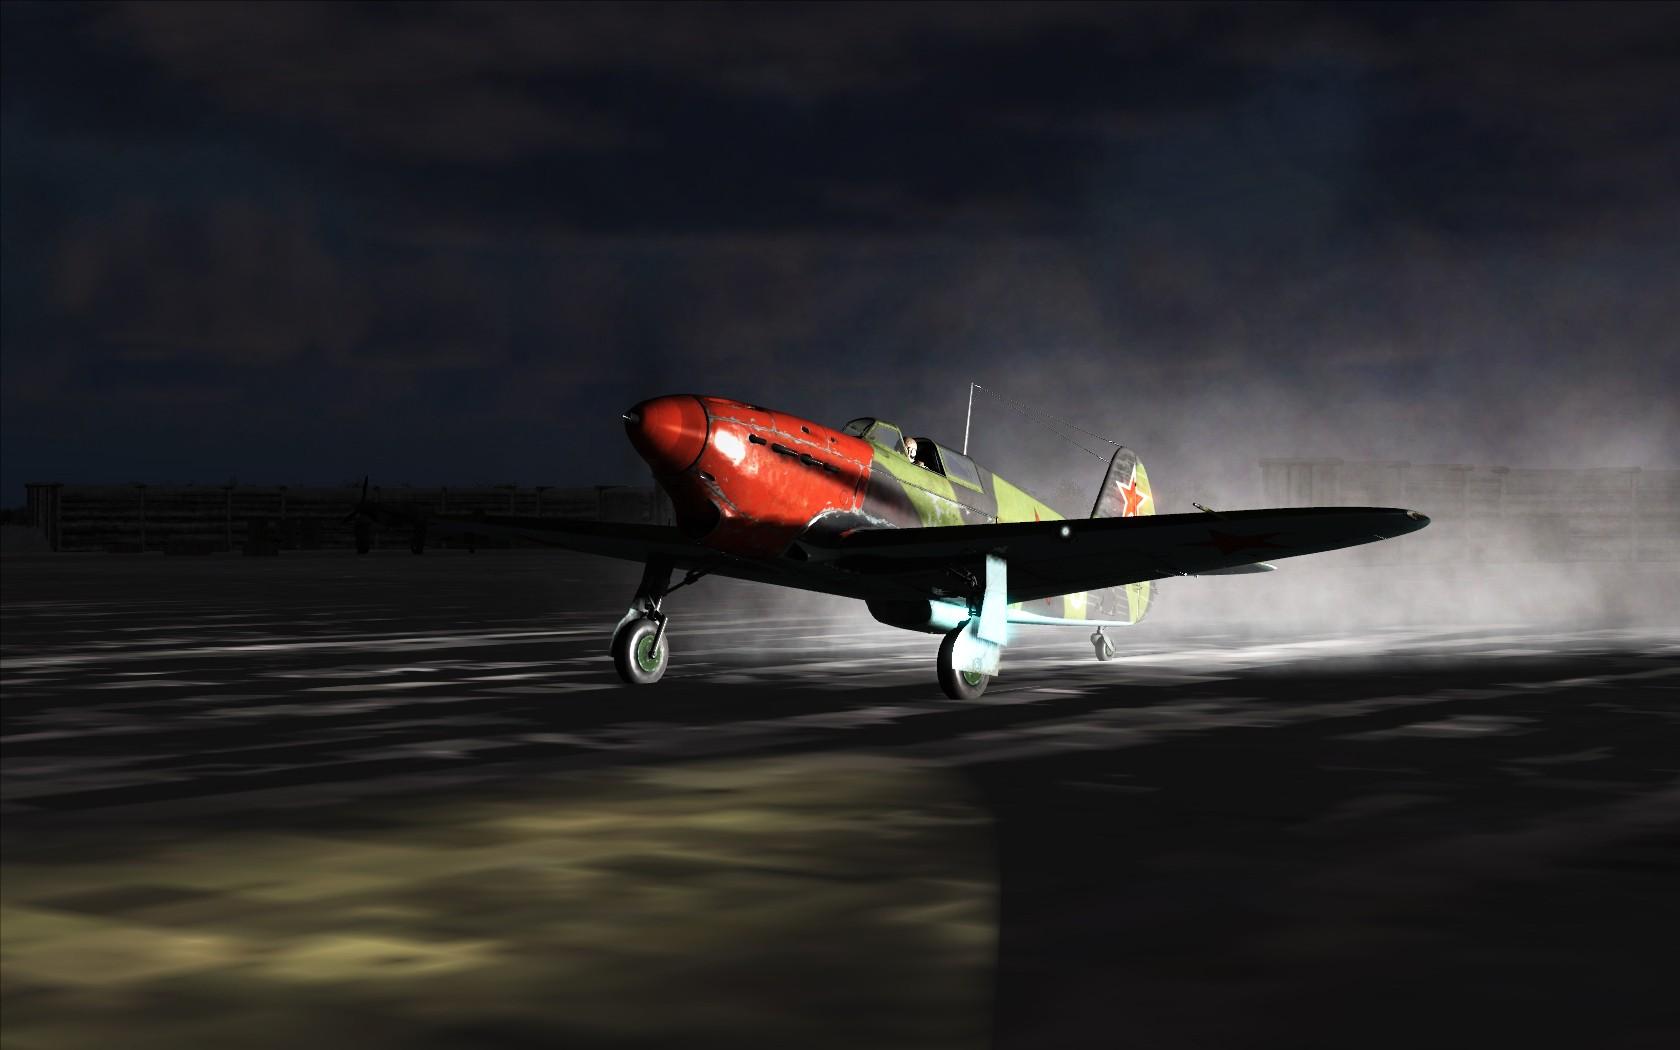 Mission M3 1210